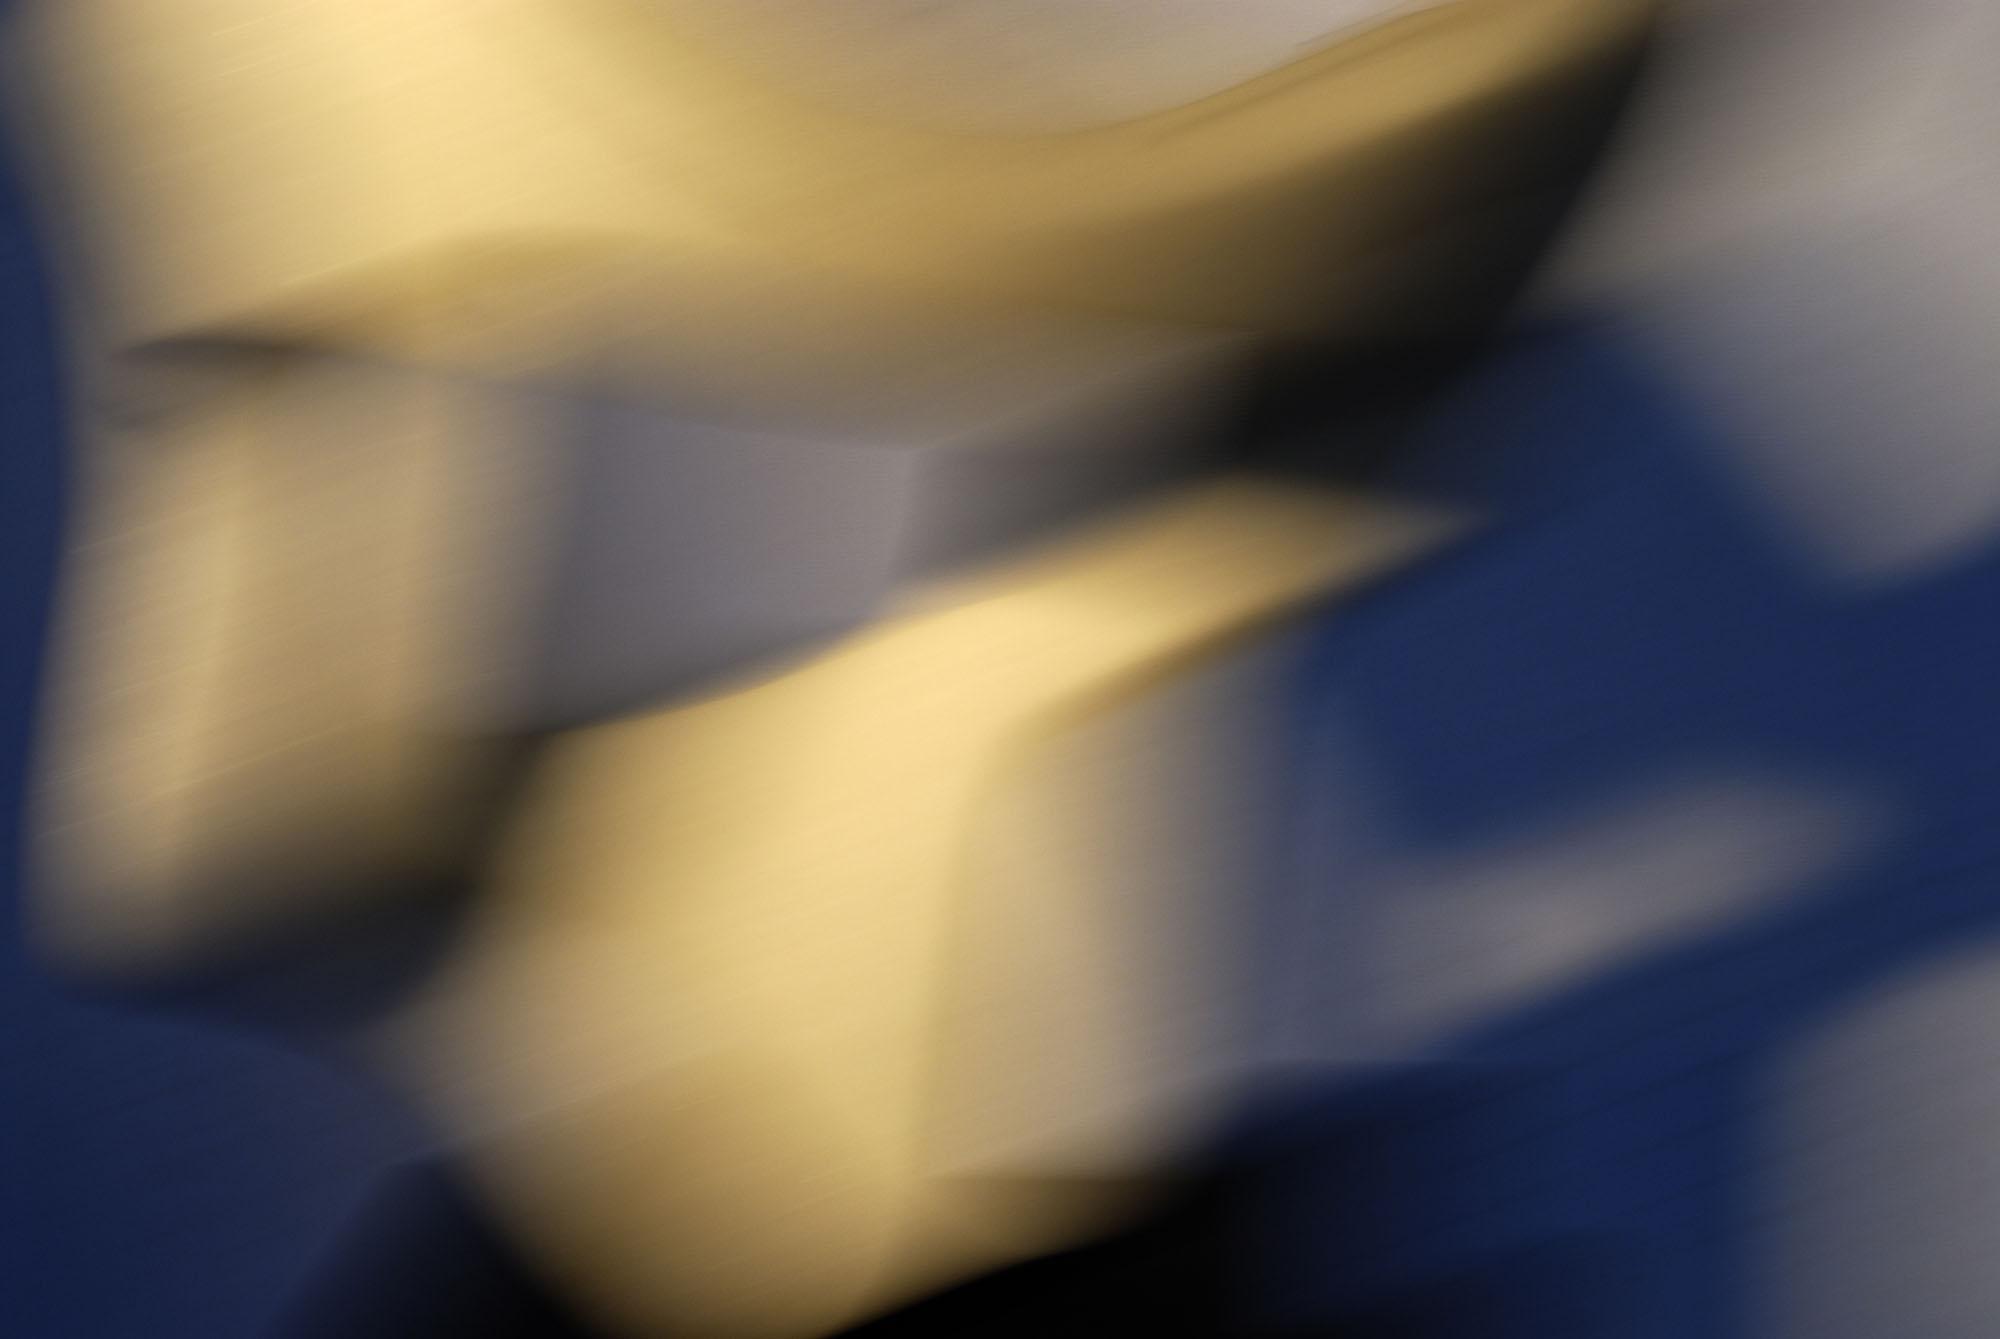 Foto van vage blauwe en gele vormen geblokt